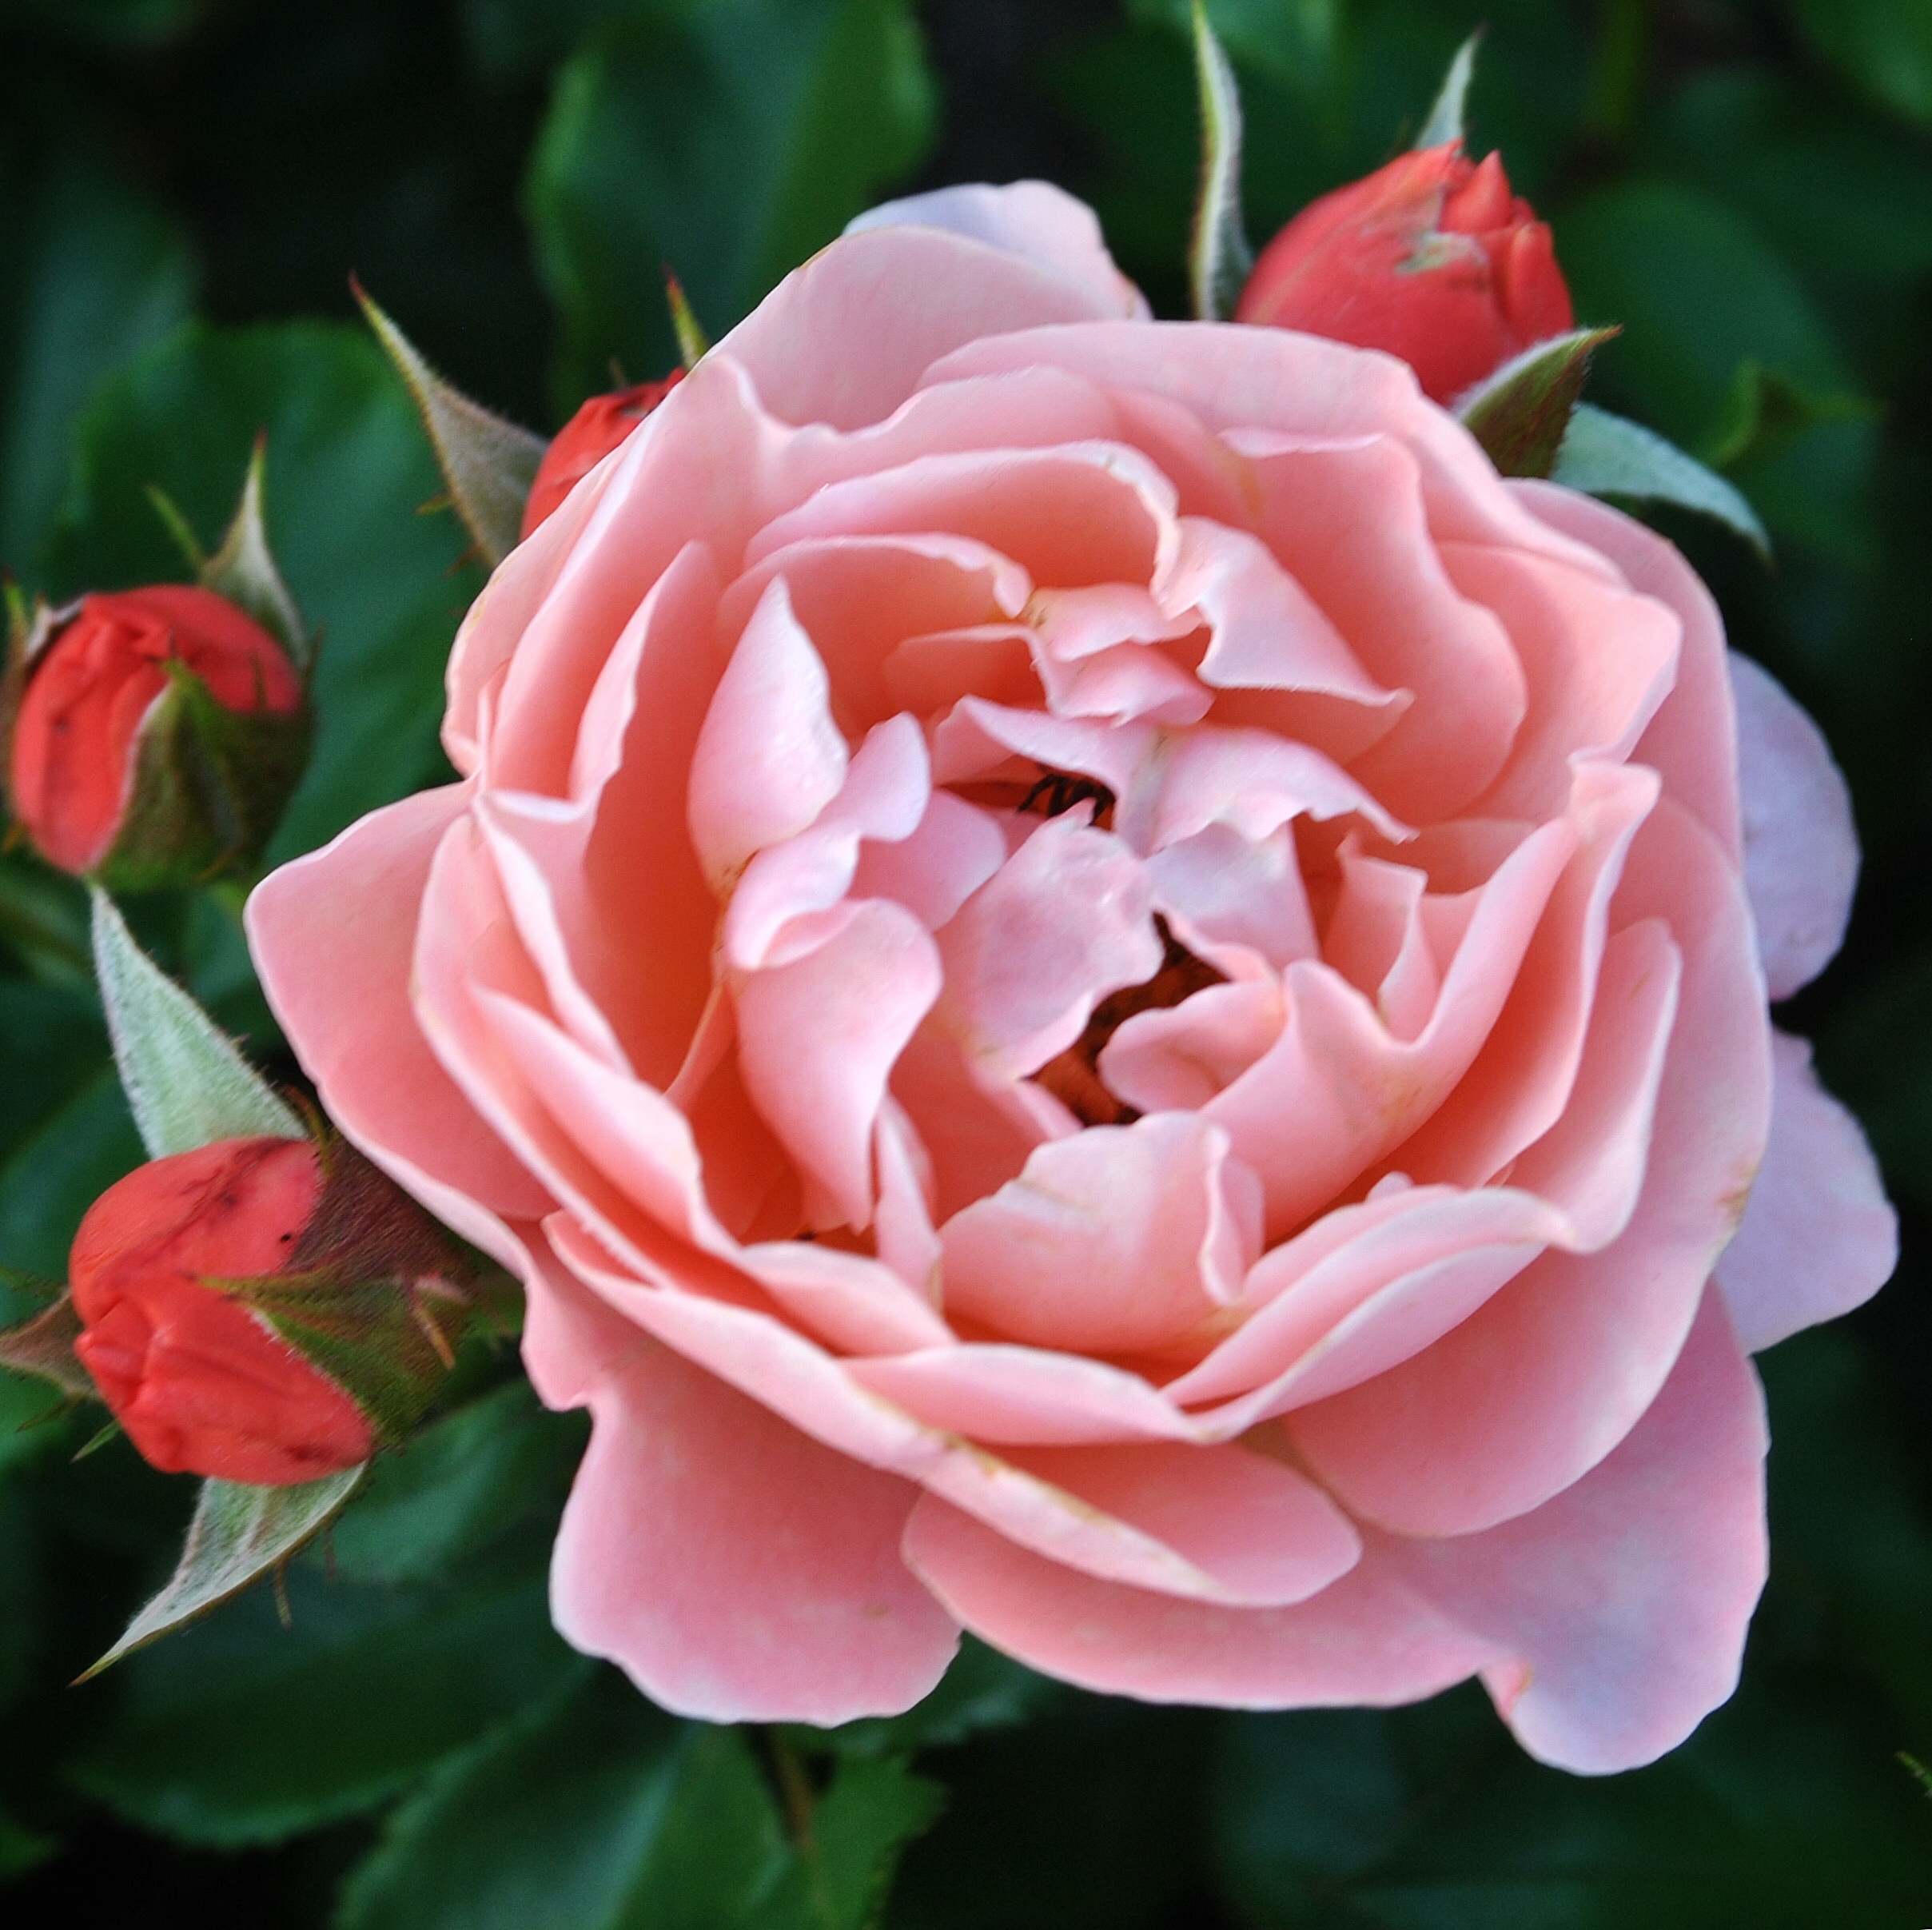 Роза квин оф свиден (queen of sweden) — описание сорта